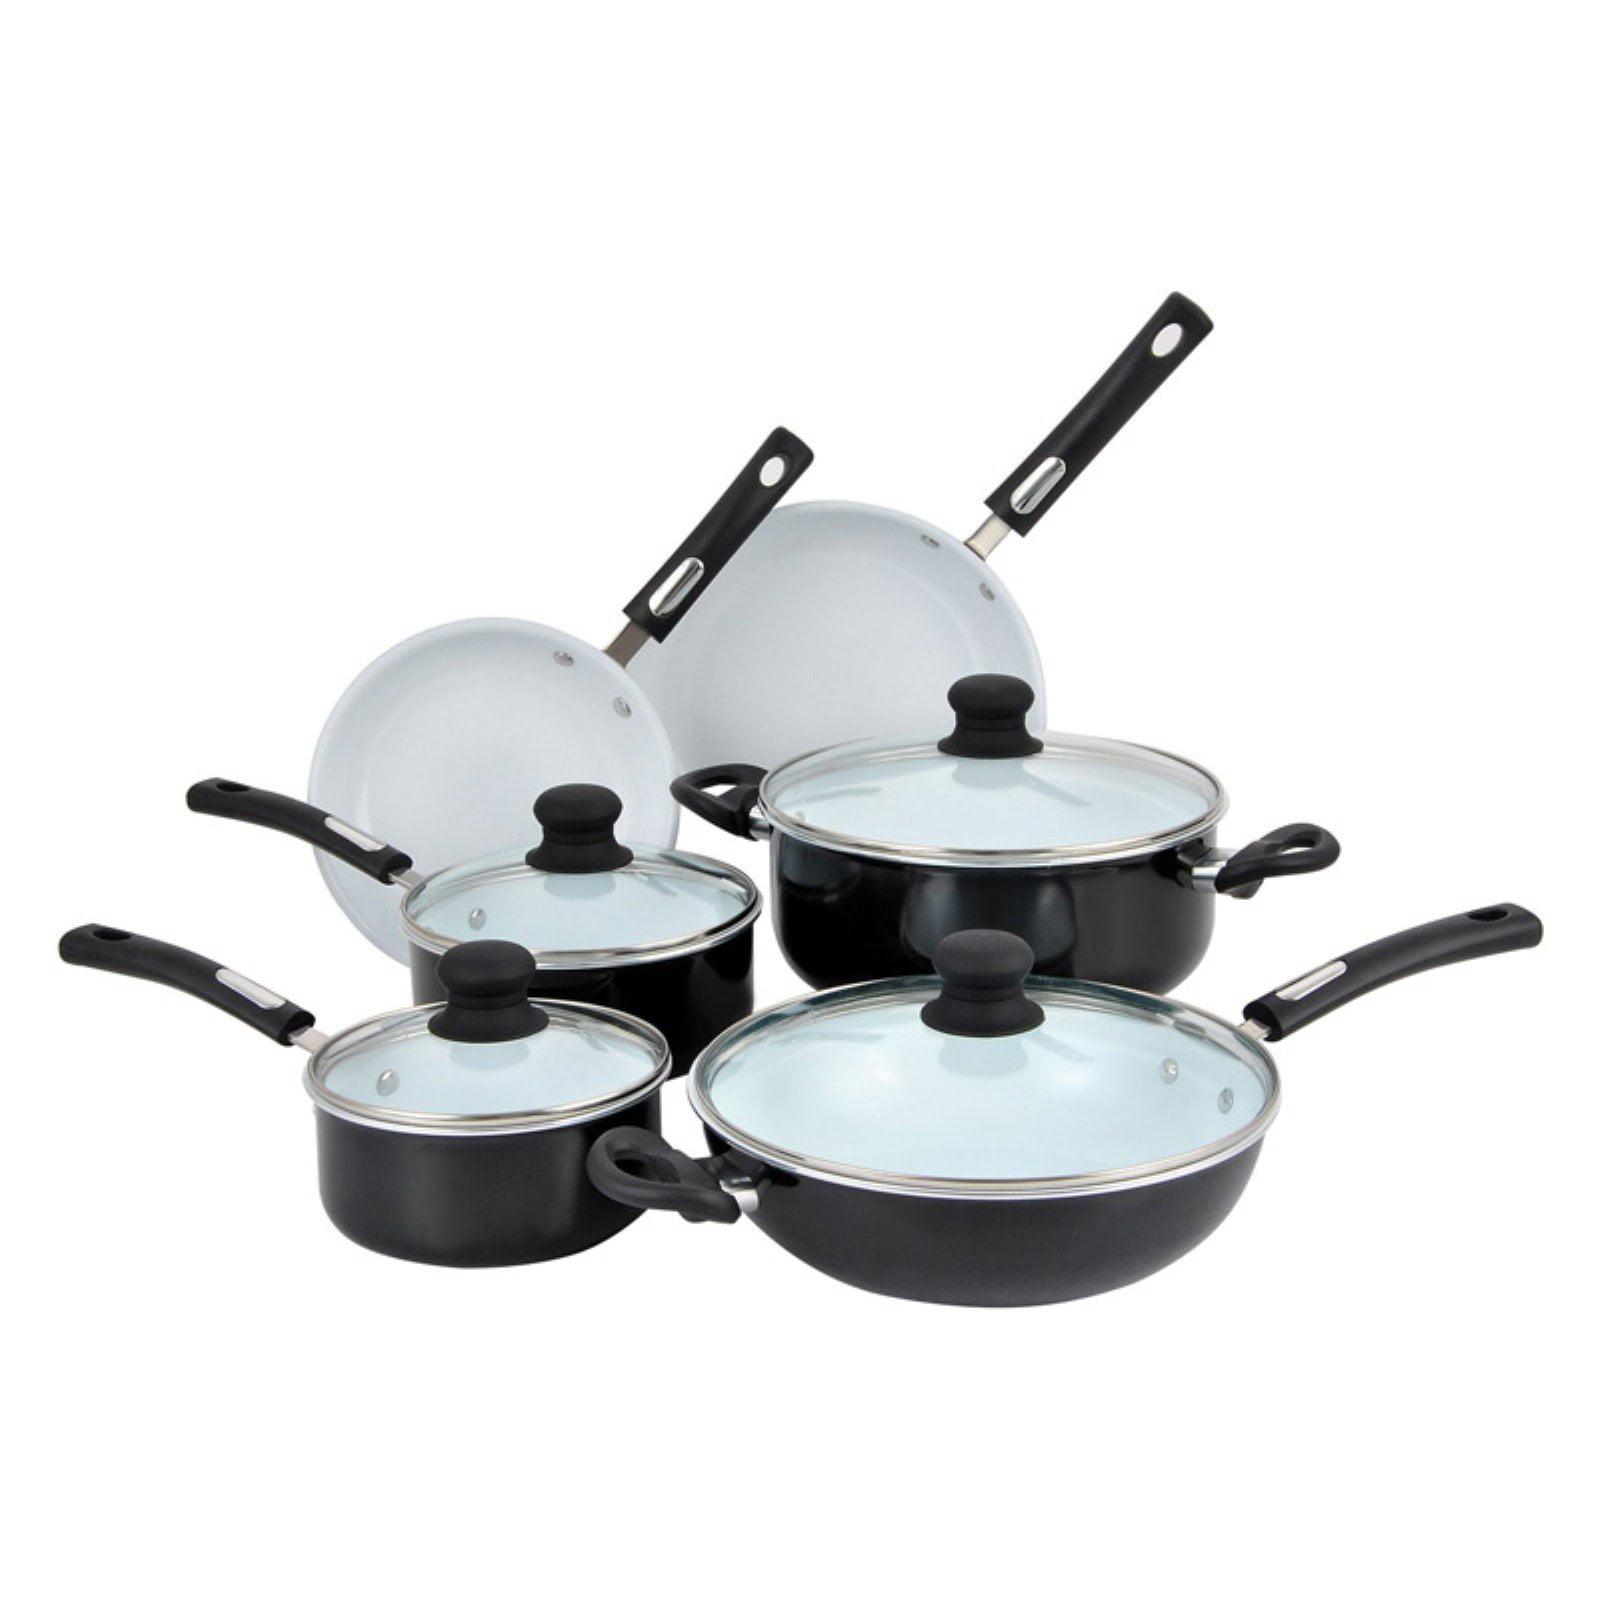 Hamilton Beach 10pc Aluminum Cookware Set, Black